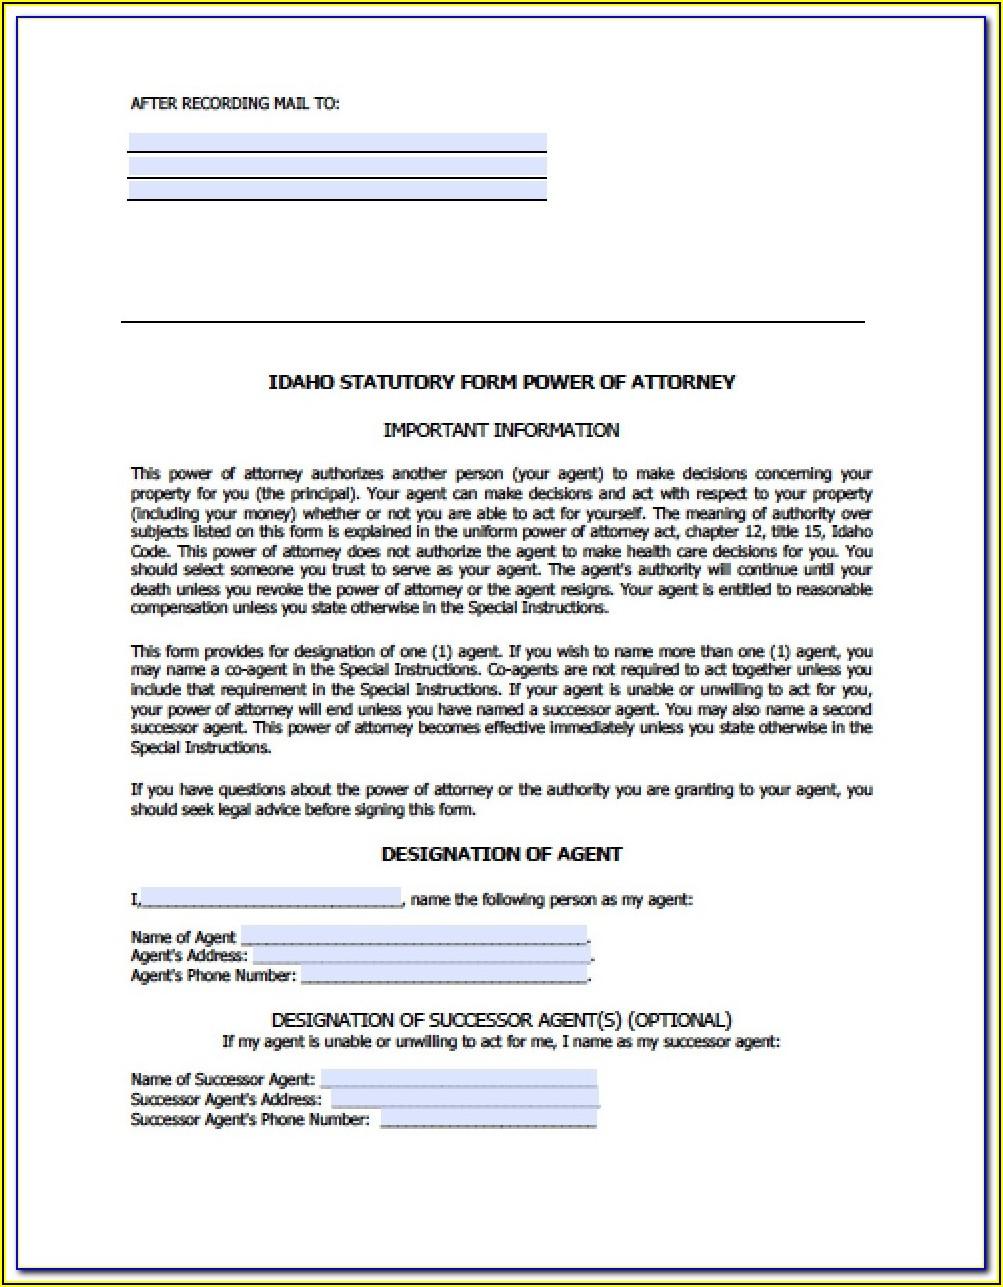 Idaho Statutory Form Of General Power Of Attorney